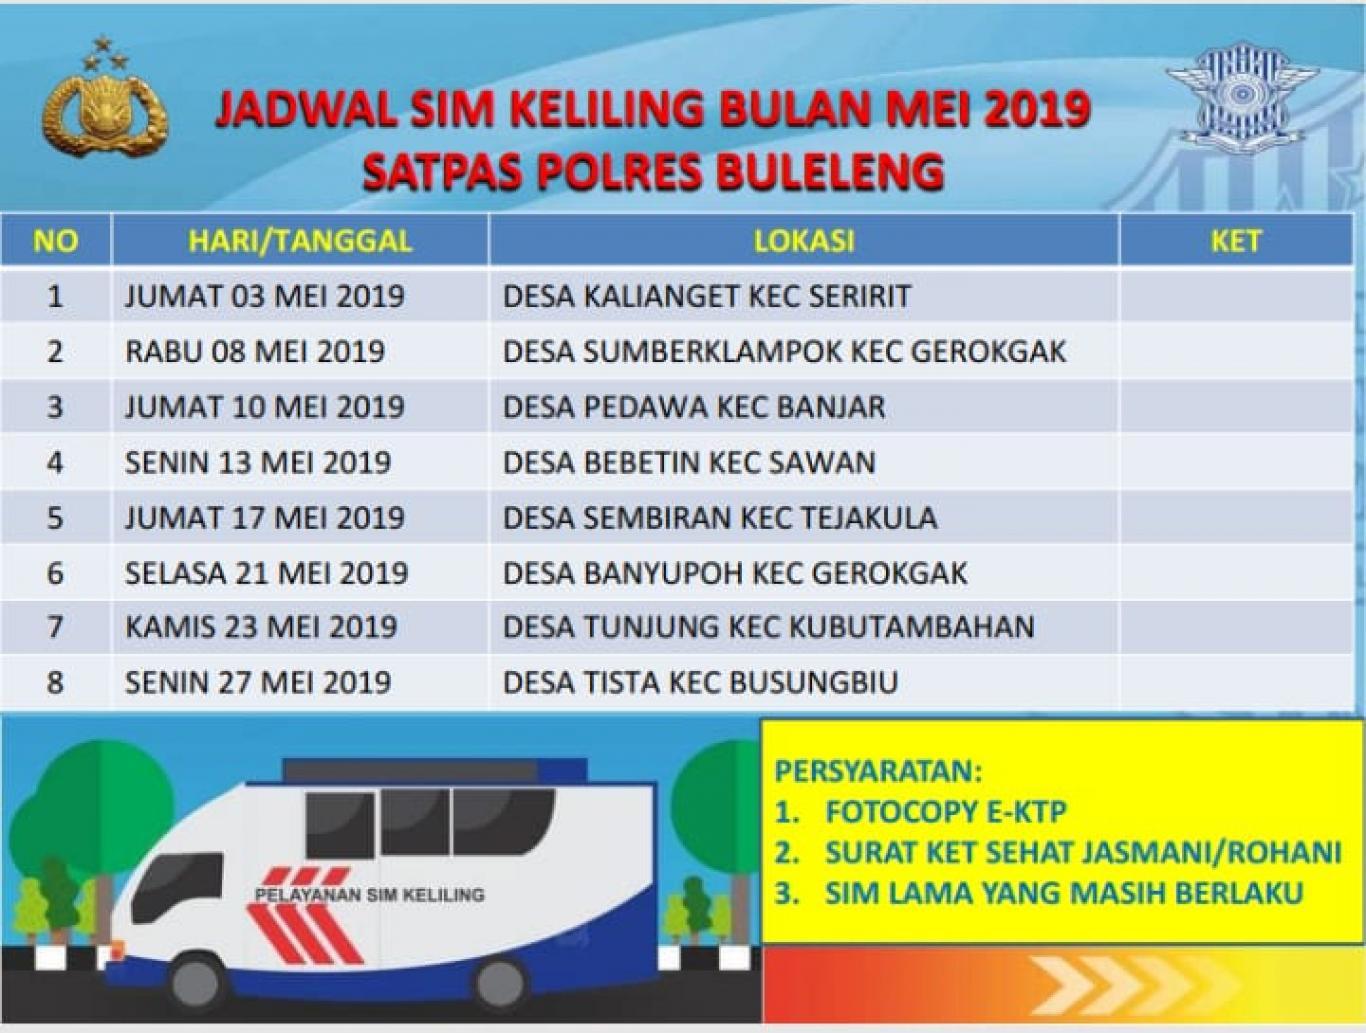 Jadwal Pelayanan Sim Keliling Bulan Mei 2019 Satpas Polres